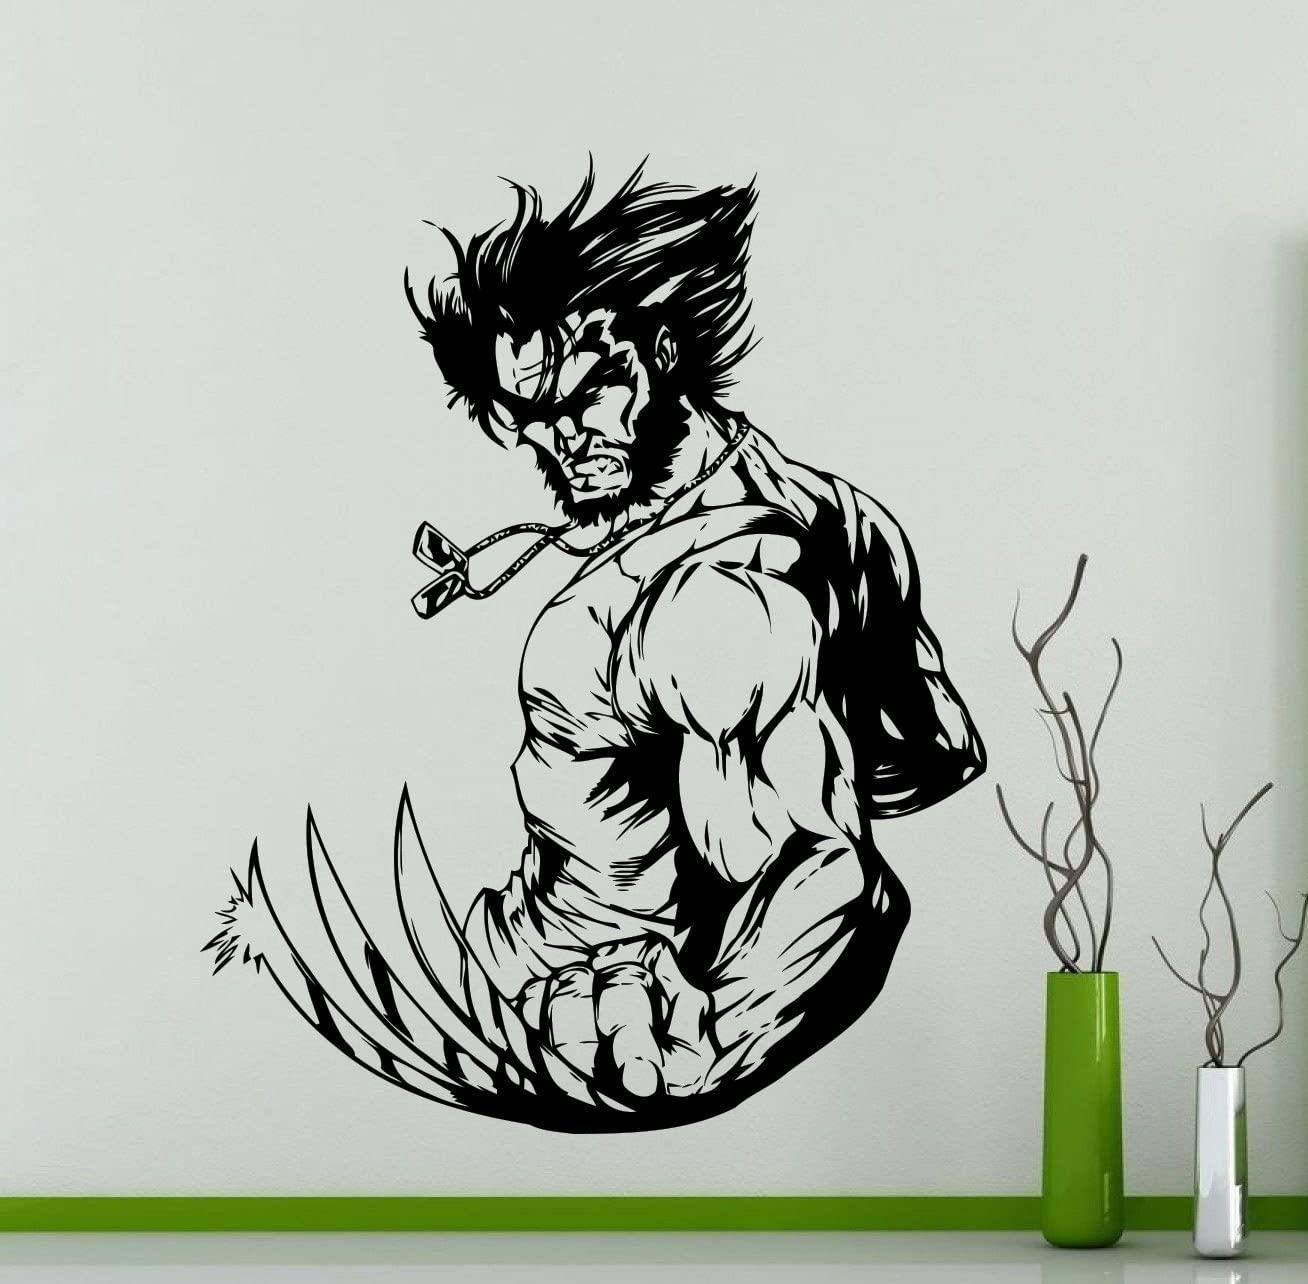 Wolverine Wall Decal Hugh Jackman Superhero DC Marvel Comics Vinyl Sticker Home Nursery Kids Boy Girl Room Interior Art Decoration Any Room Mural Waterproof Vinyl Sticker (284su)